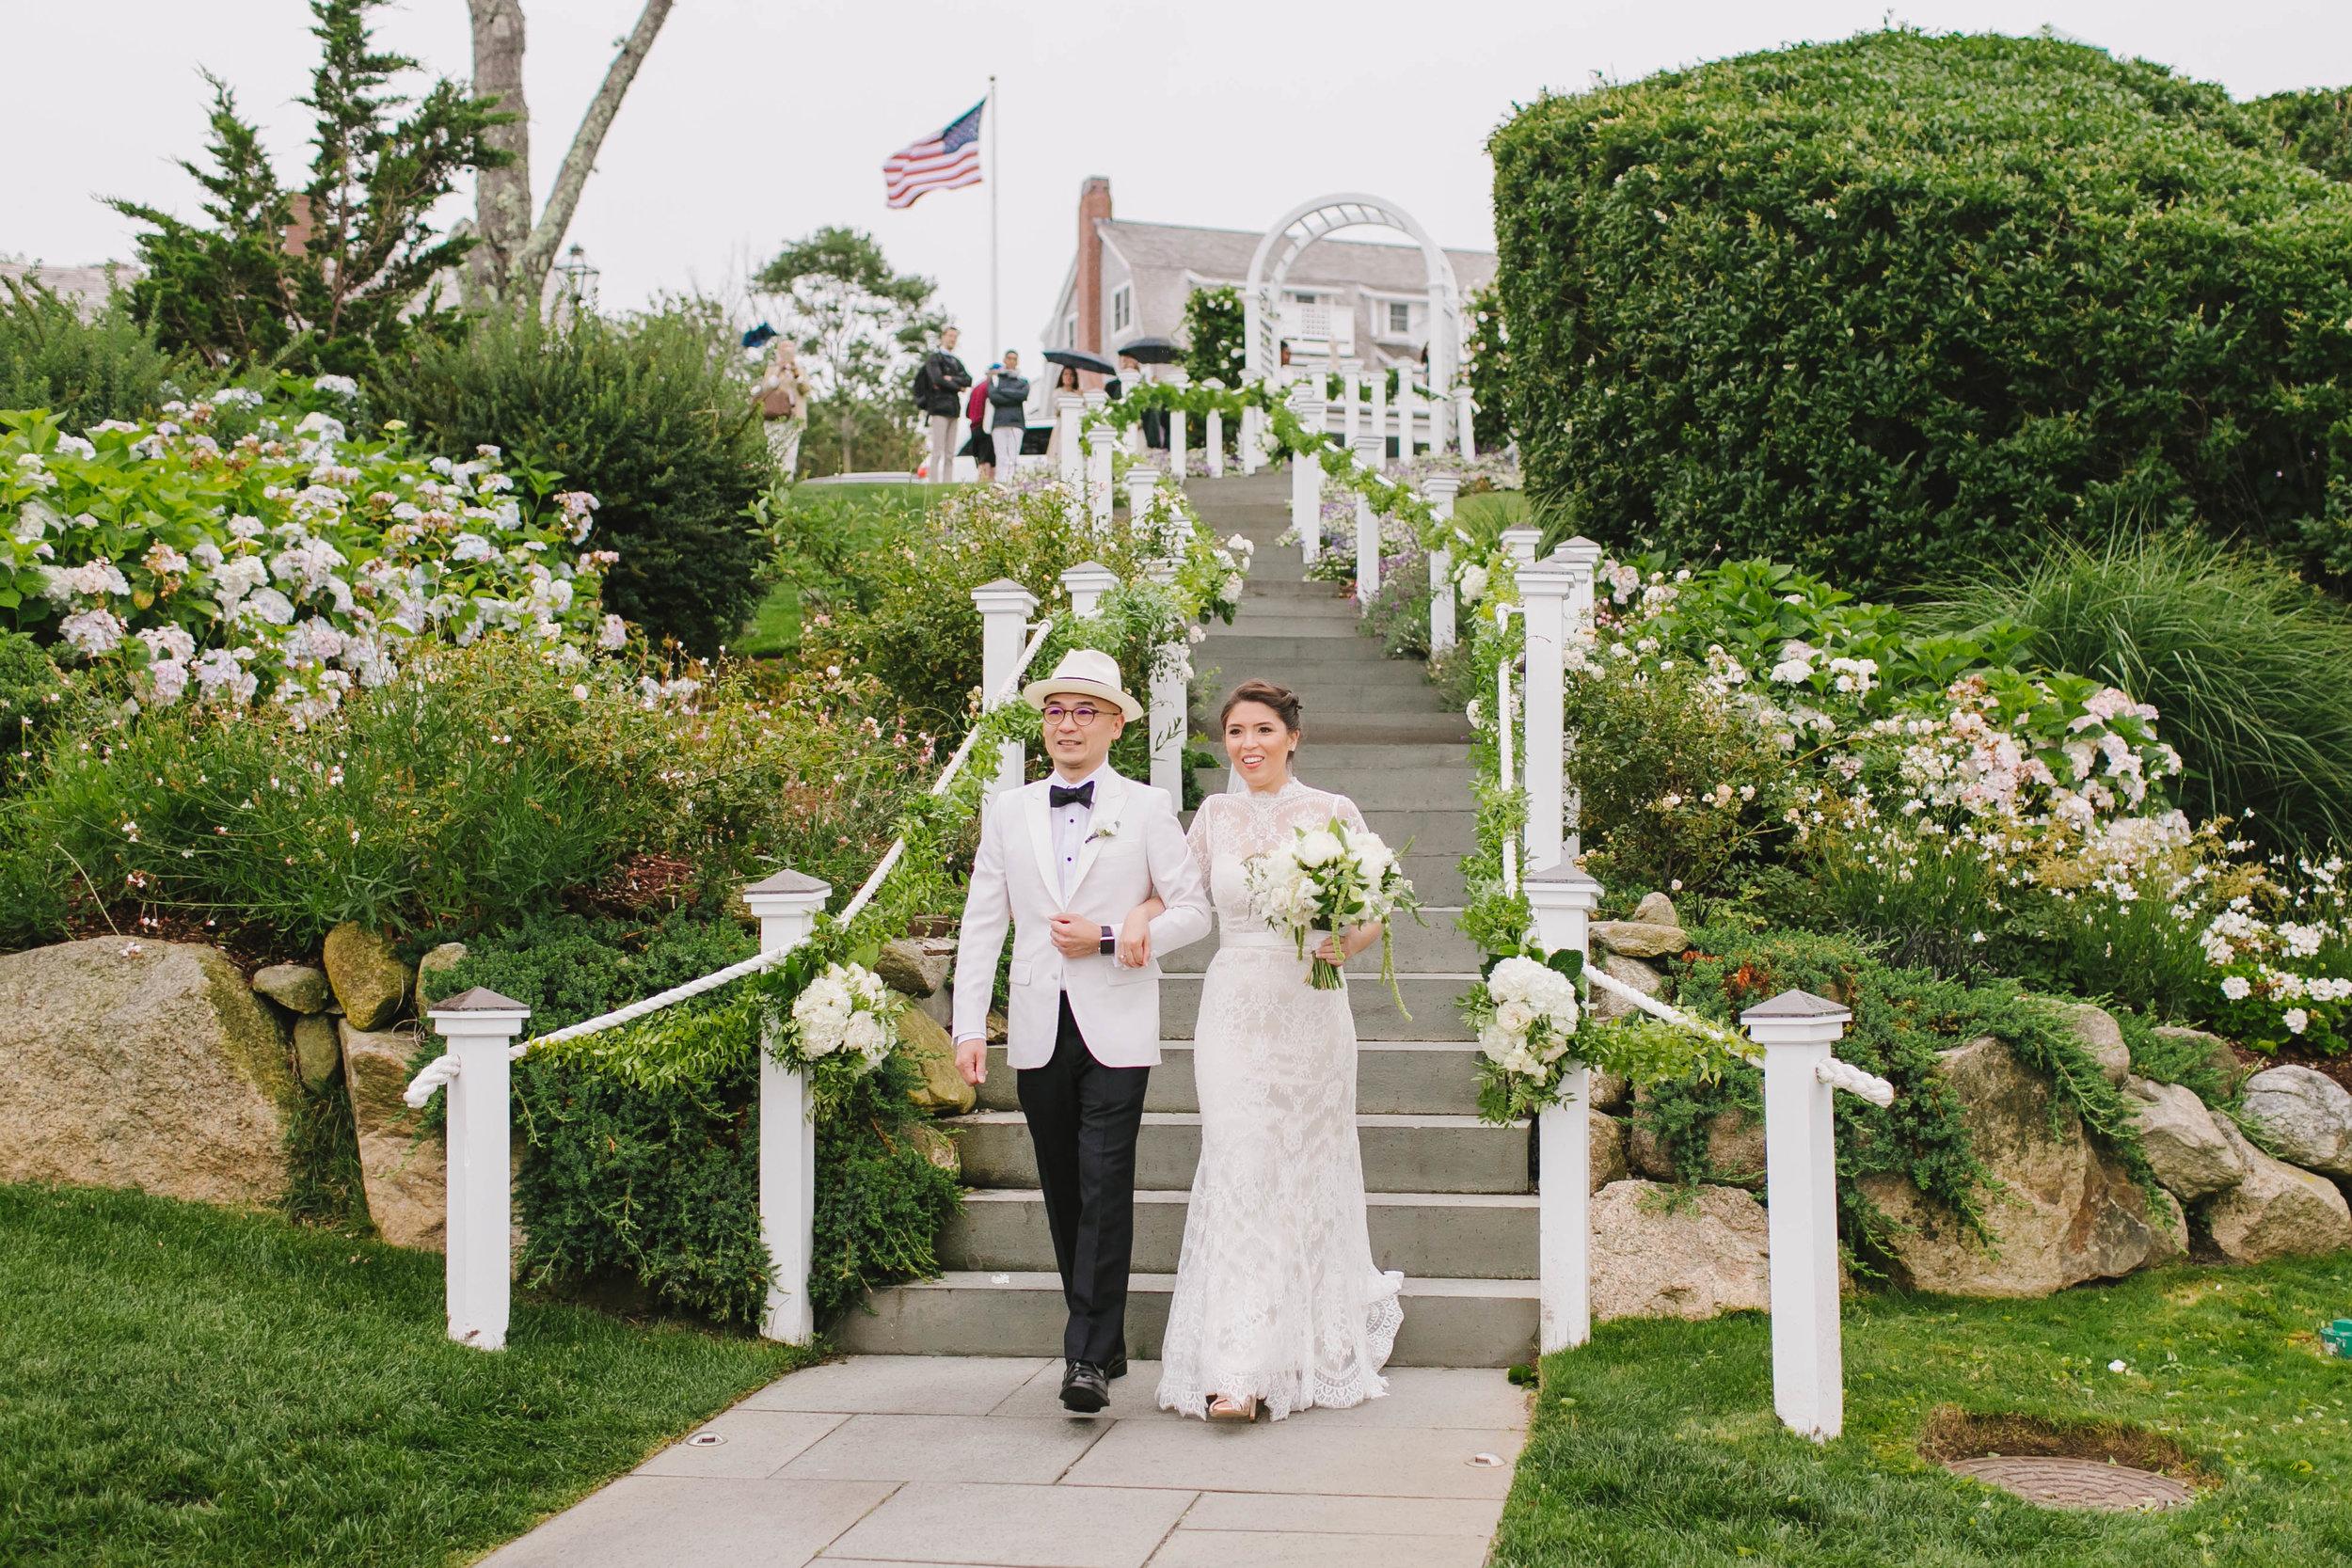 Chatham Bars Inn Cape Cod MA Rain Rainy Wedding with Dog - Emily Tebbetts Photography-1-2.jpg